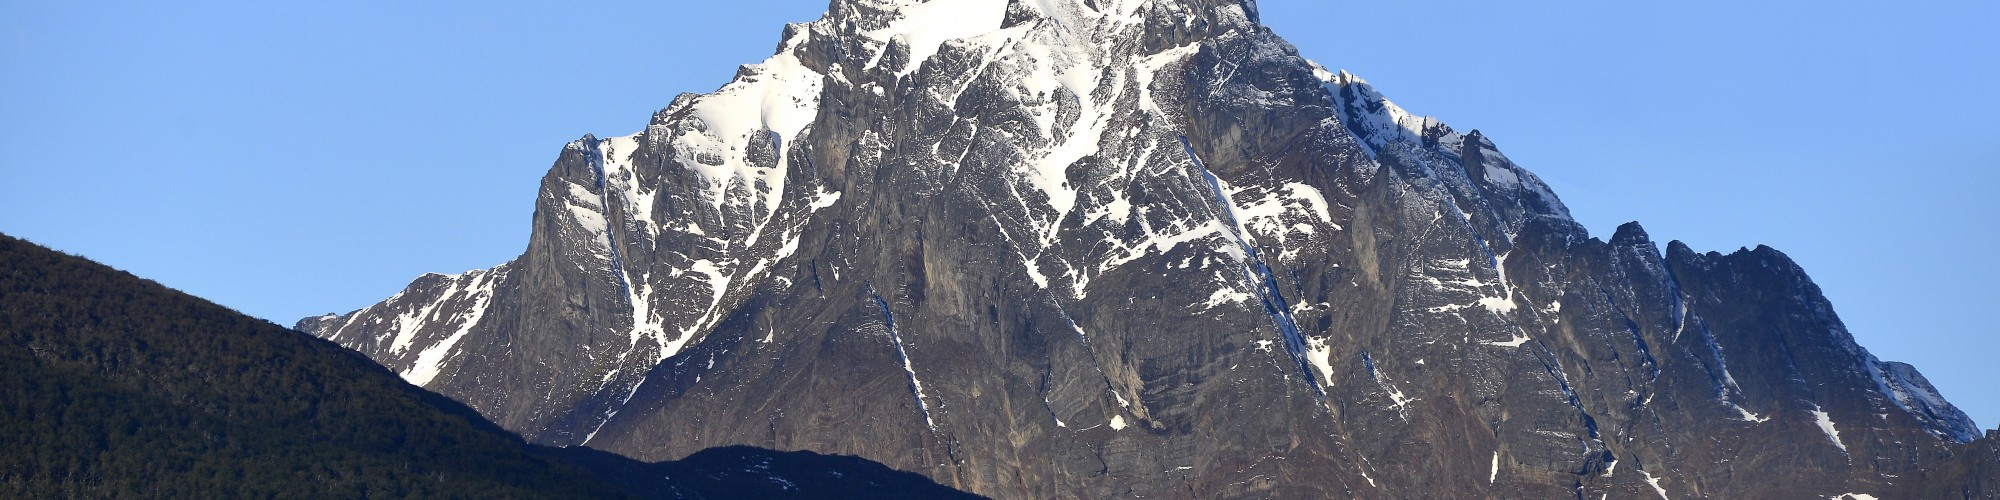 1 - Arakur and Mount Olivia - Summer